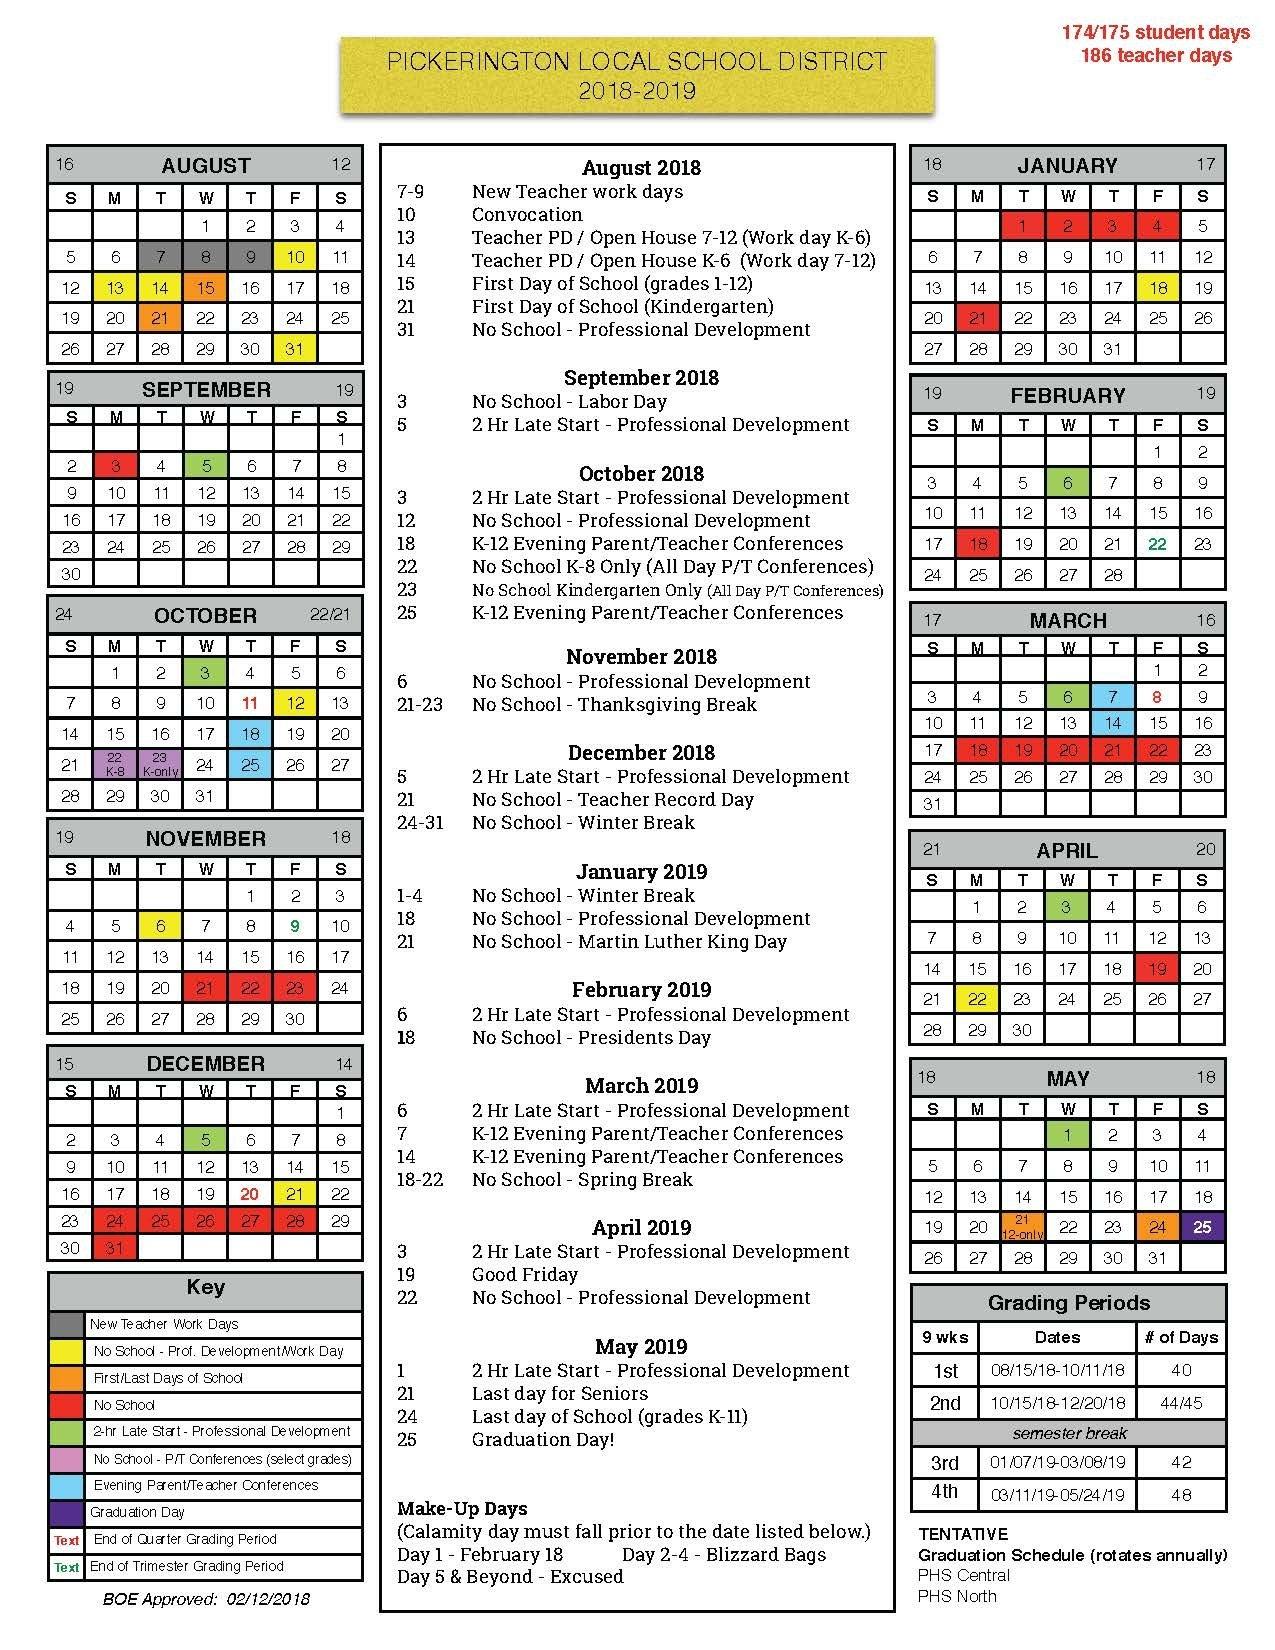 Board Of Education Approves 2018-19 Calendar - Pickerington Local School District 5 Calendar 2019